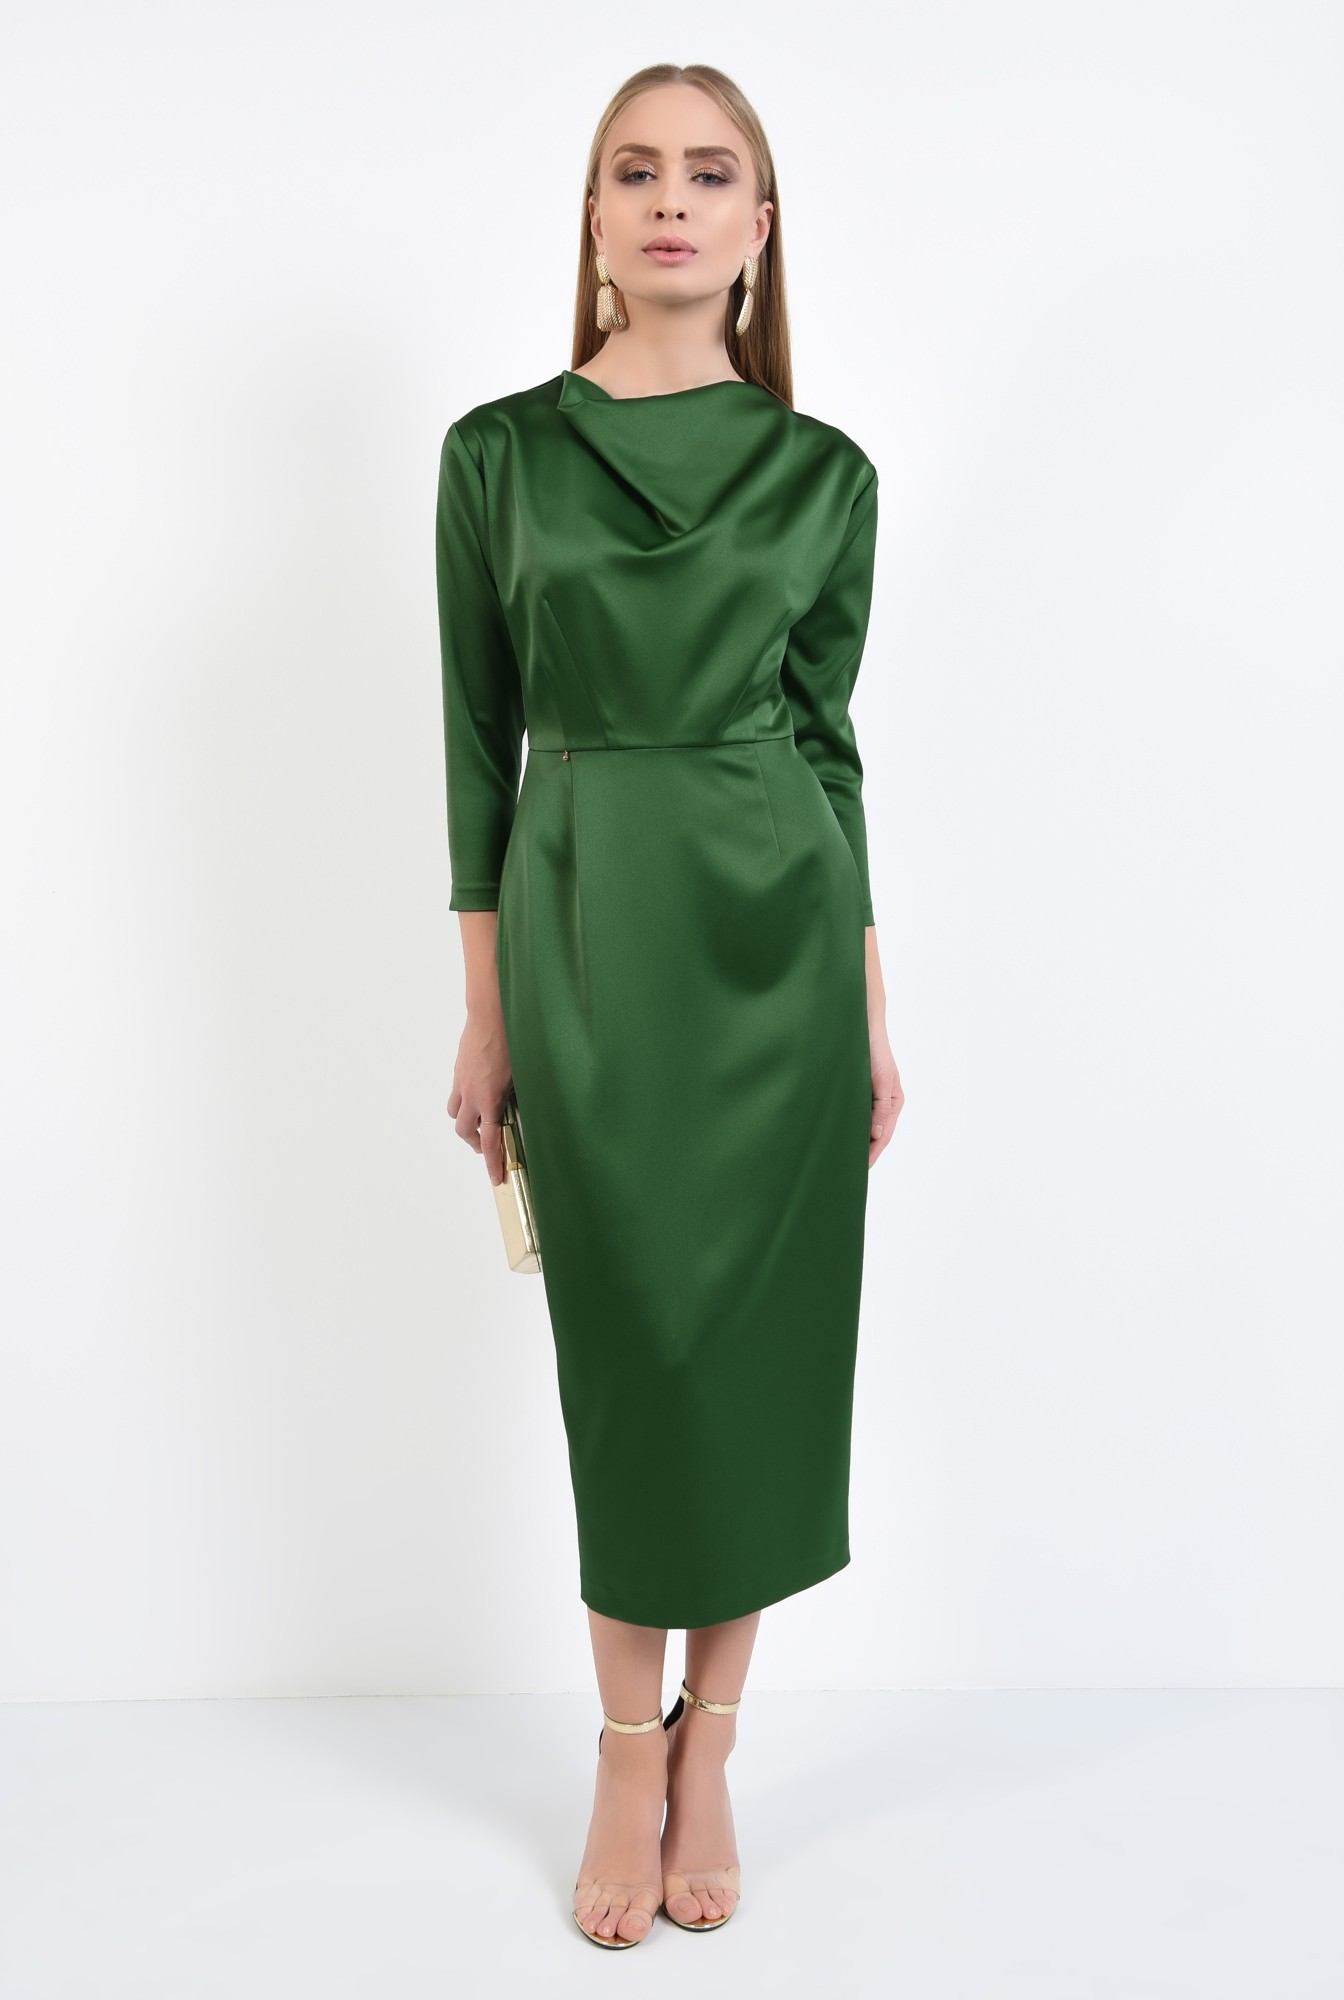 3 - rochie de ocazie, verde, maneci ajustate, drapata la decolteu